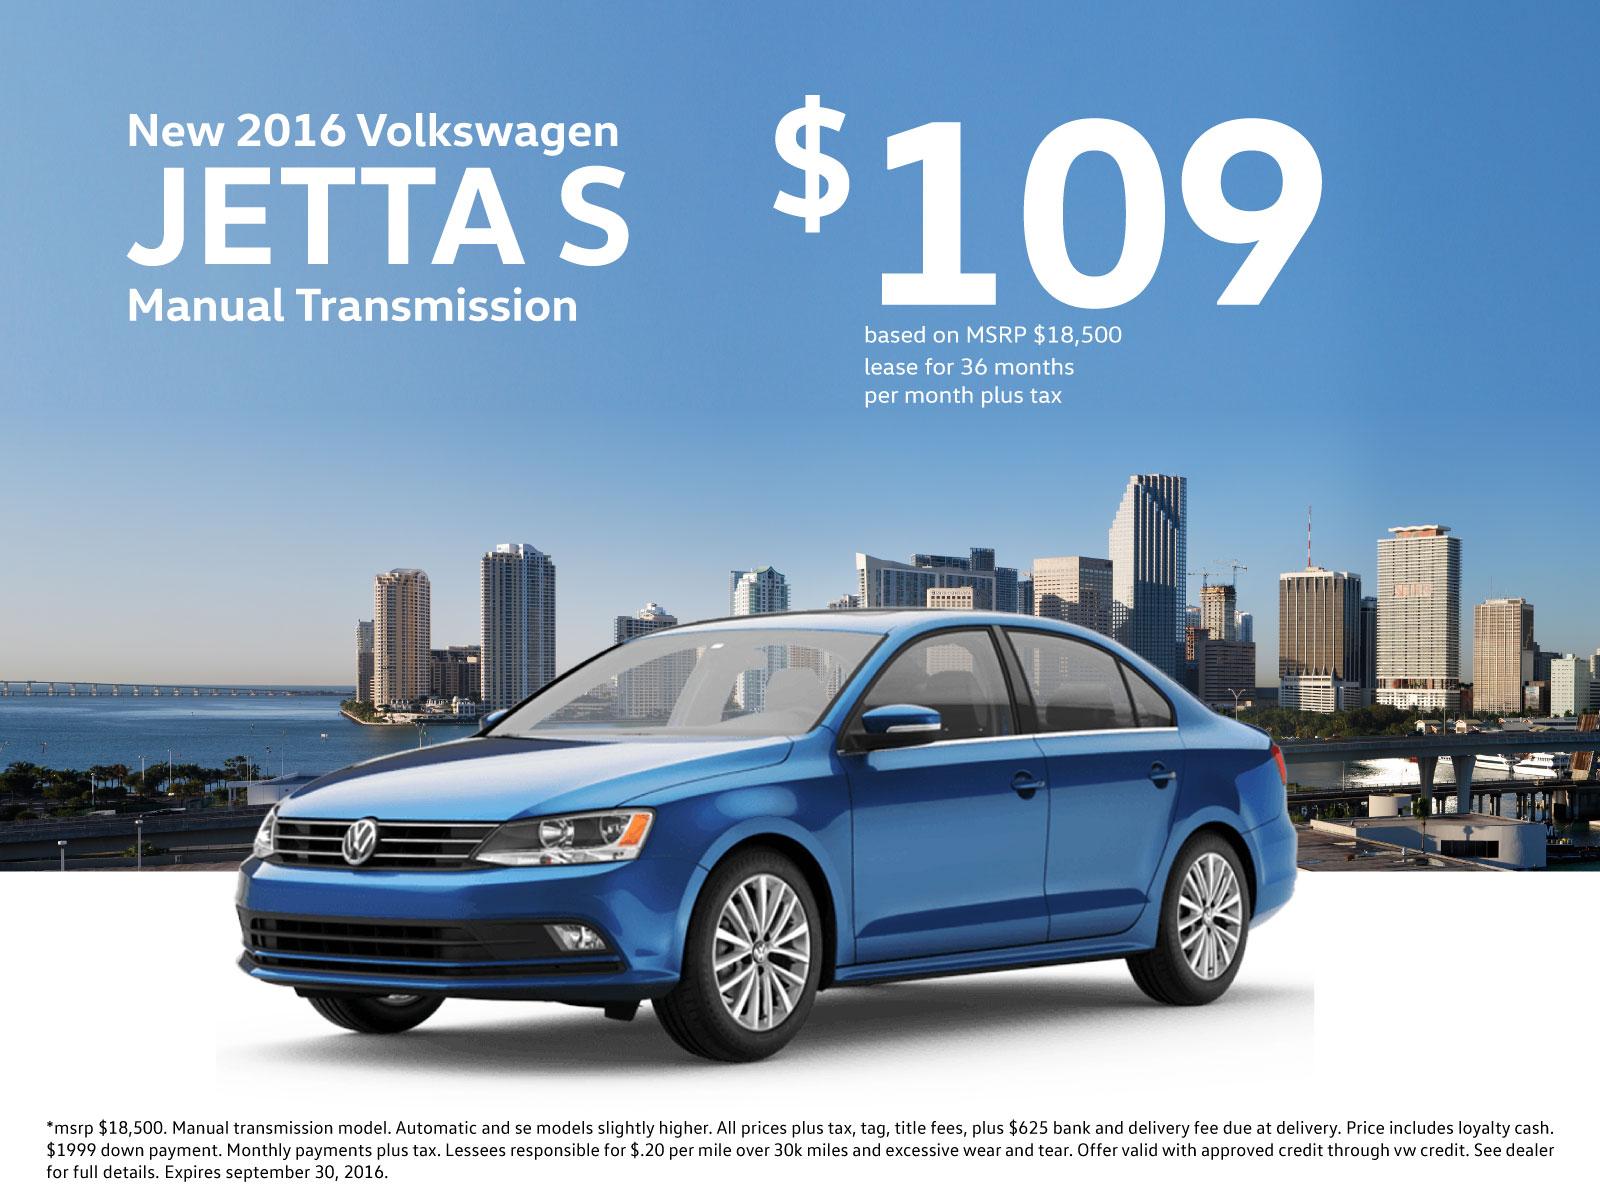 Volkswagen Specials in Miami